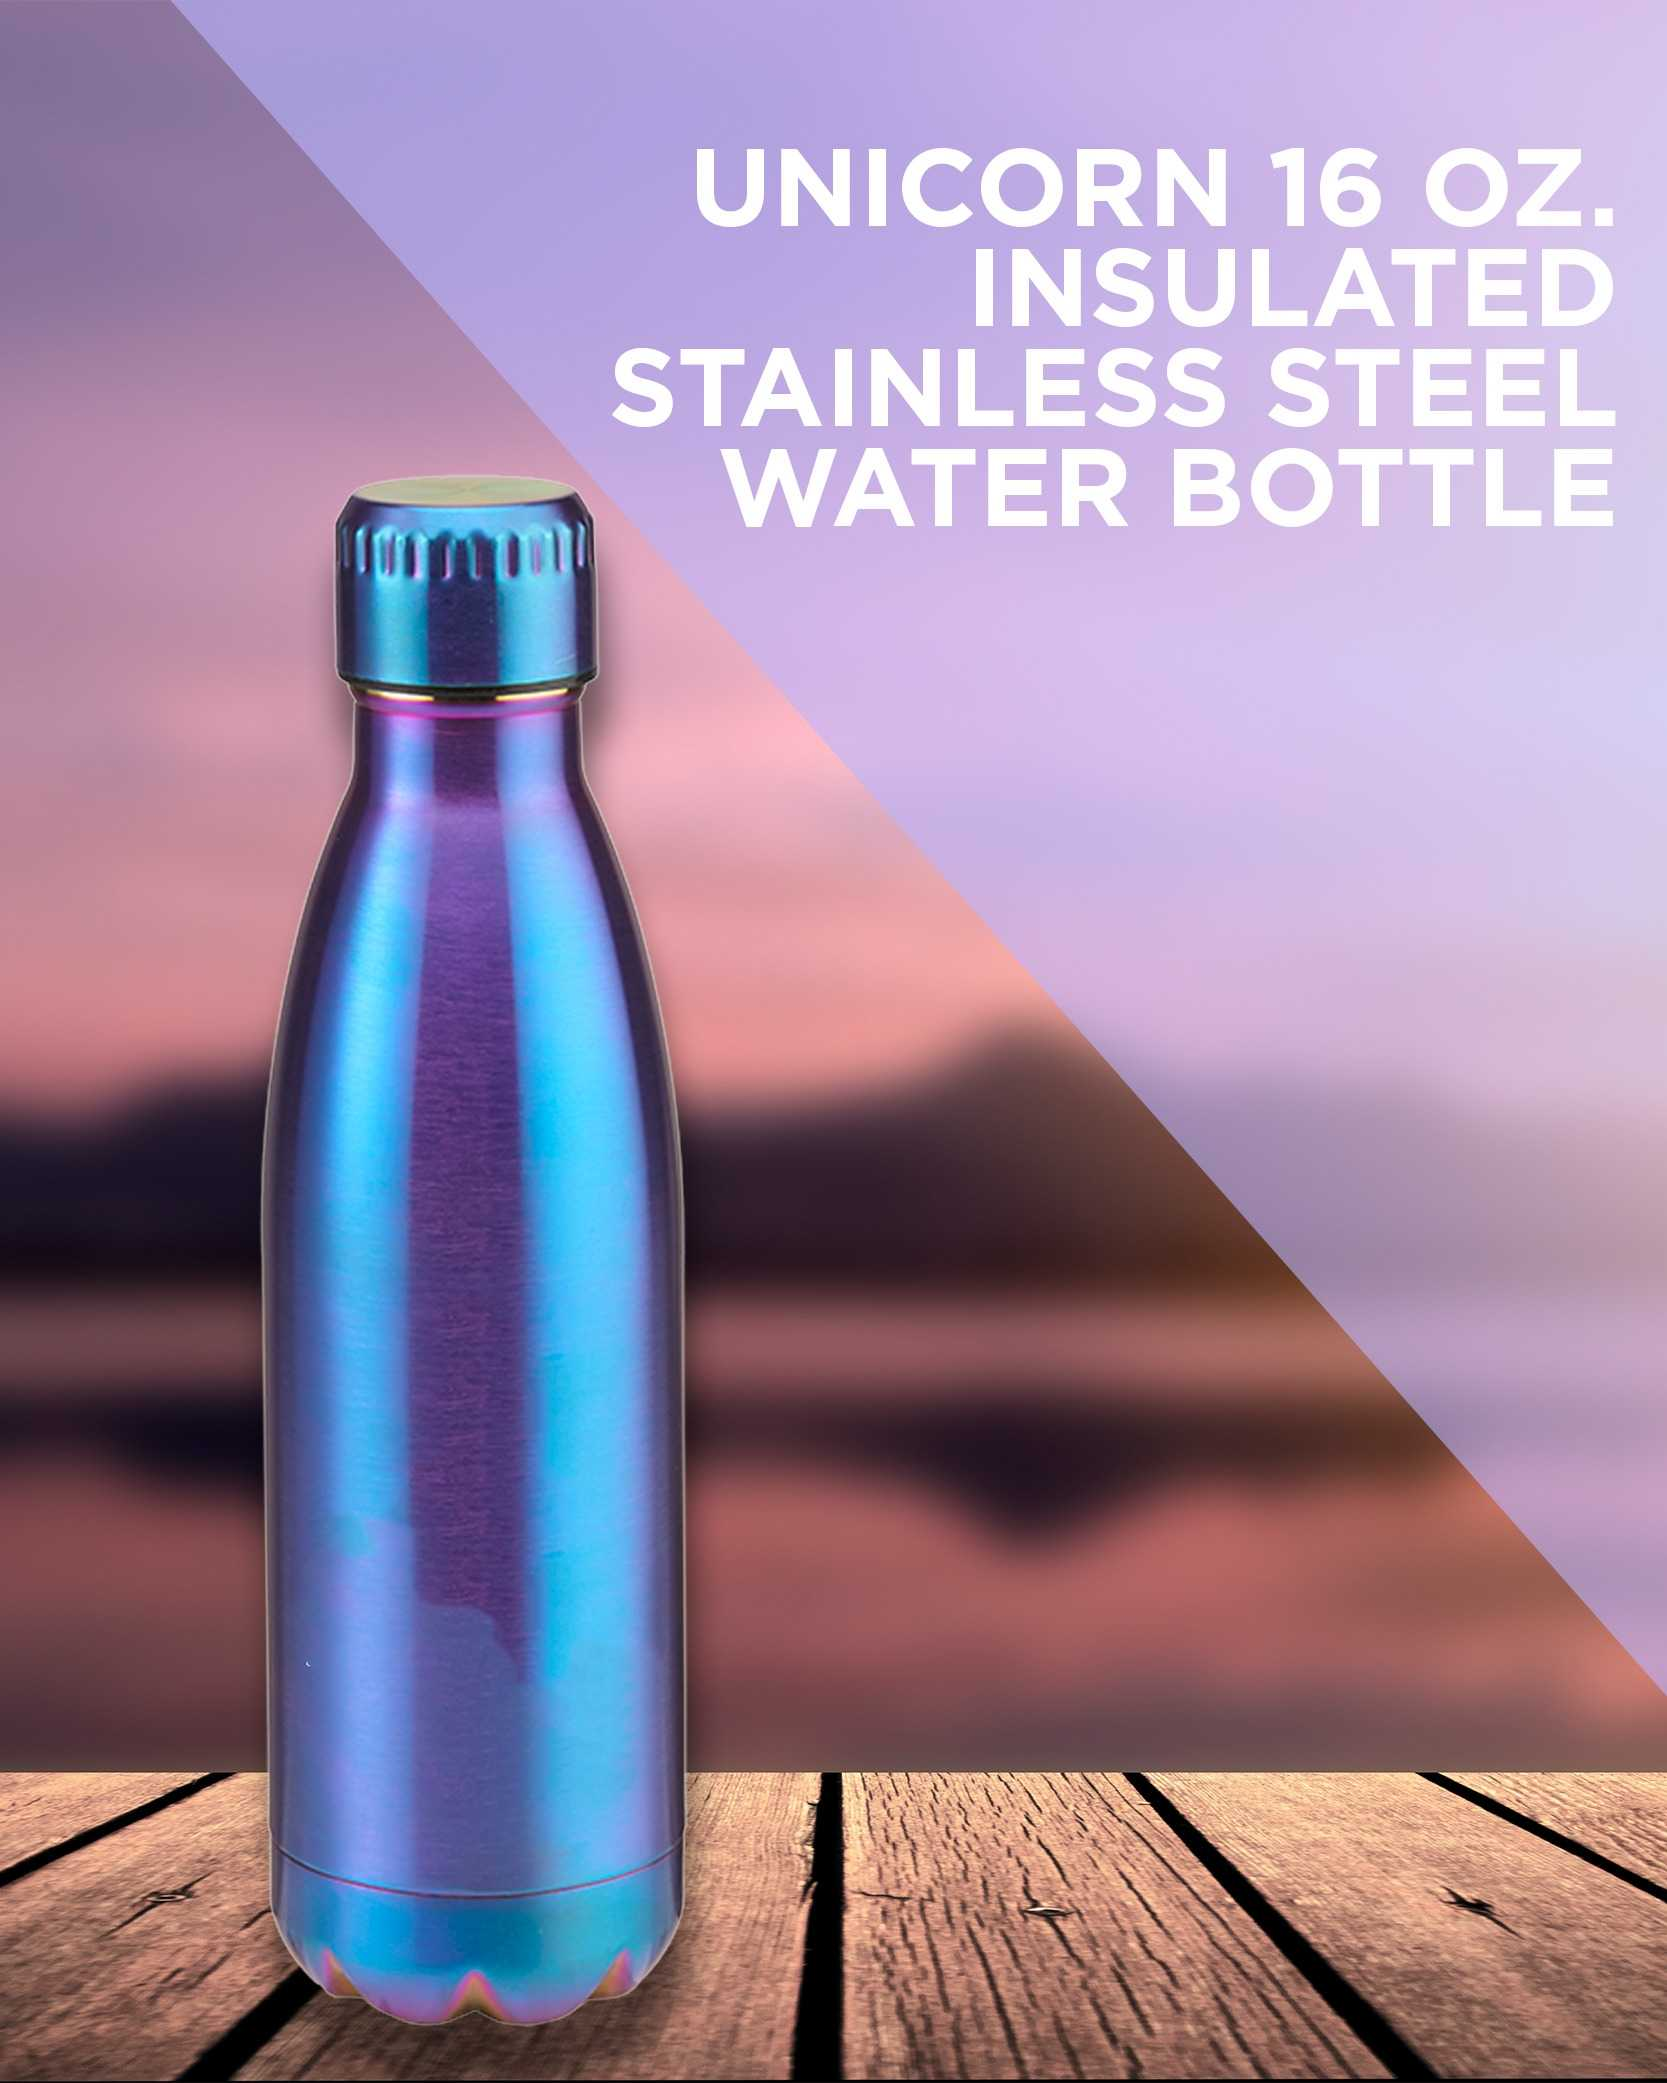 AIM 16oz unicorn stainless steel water bottle